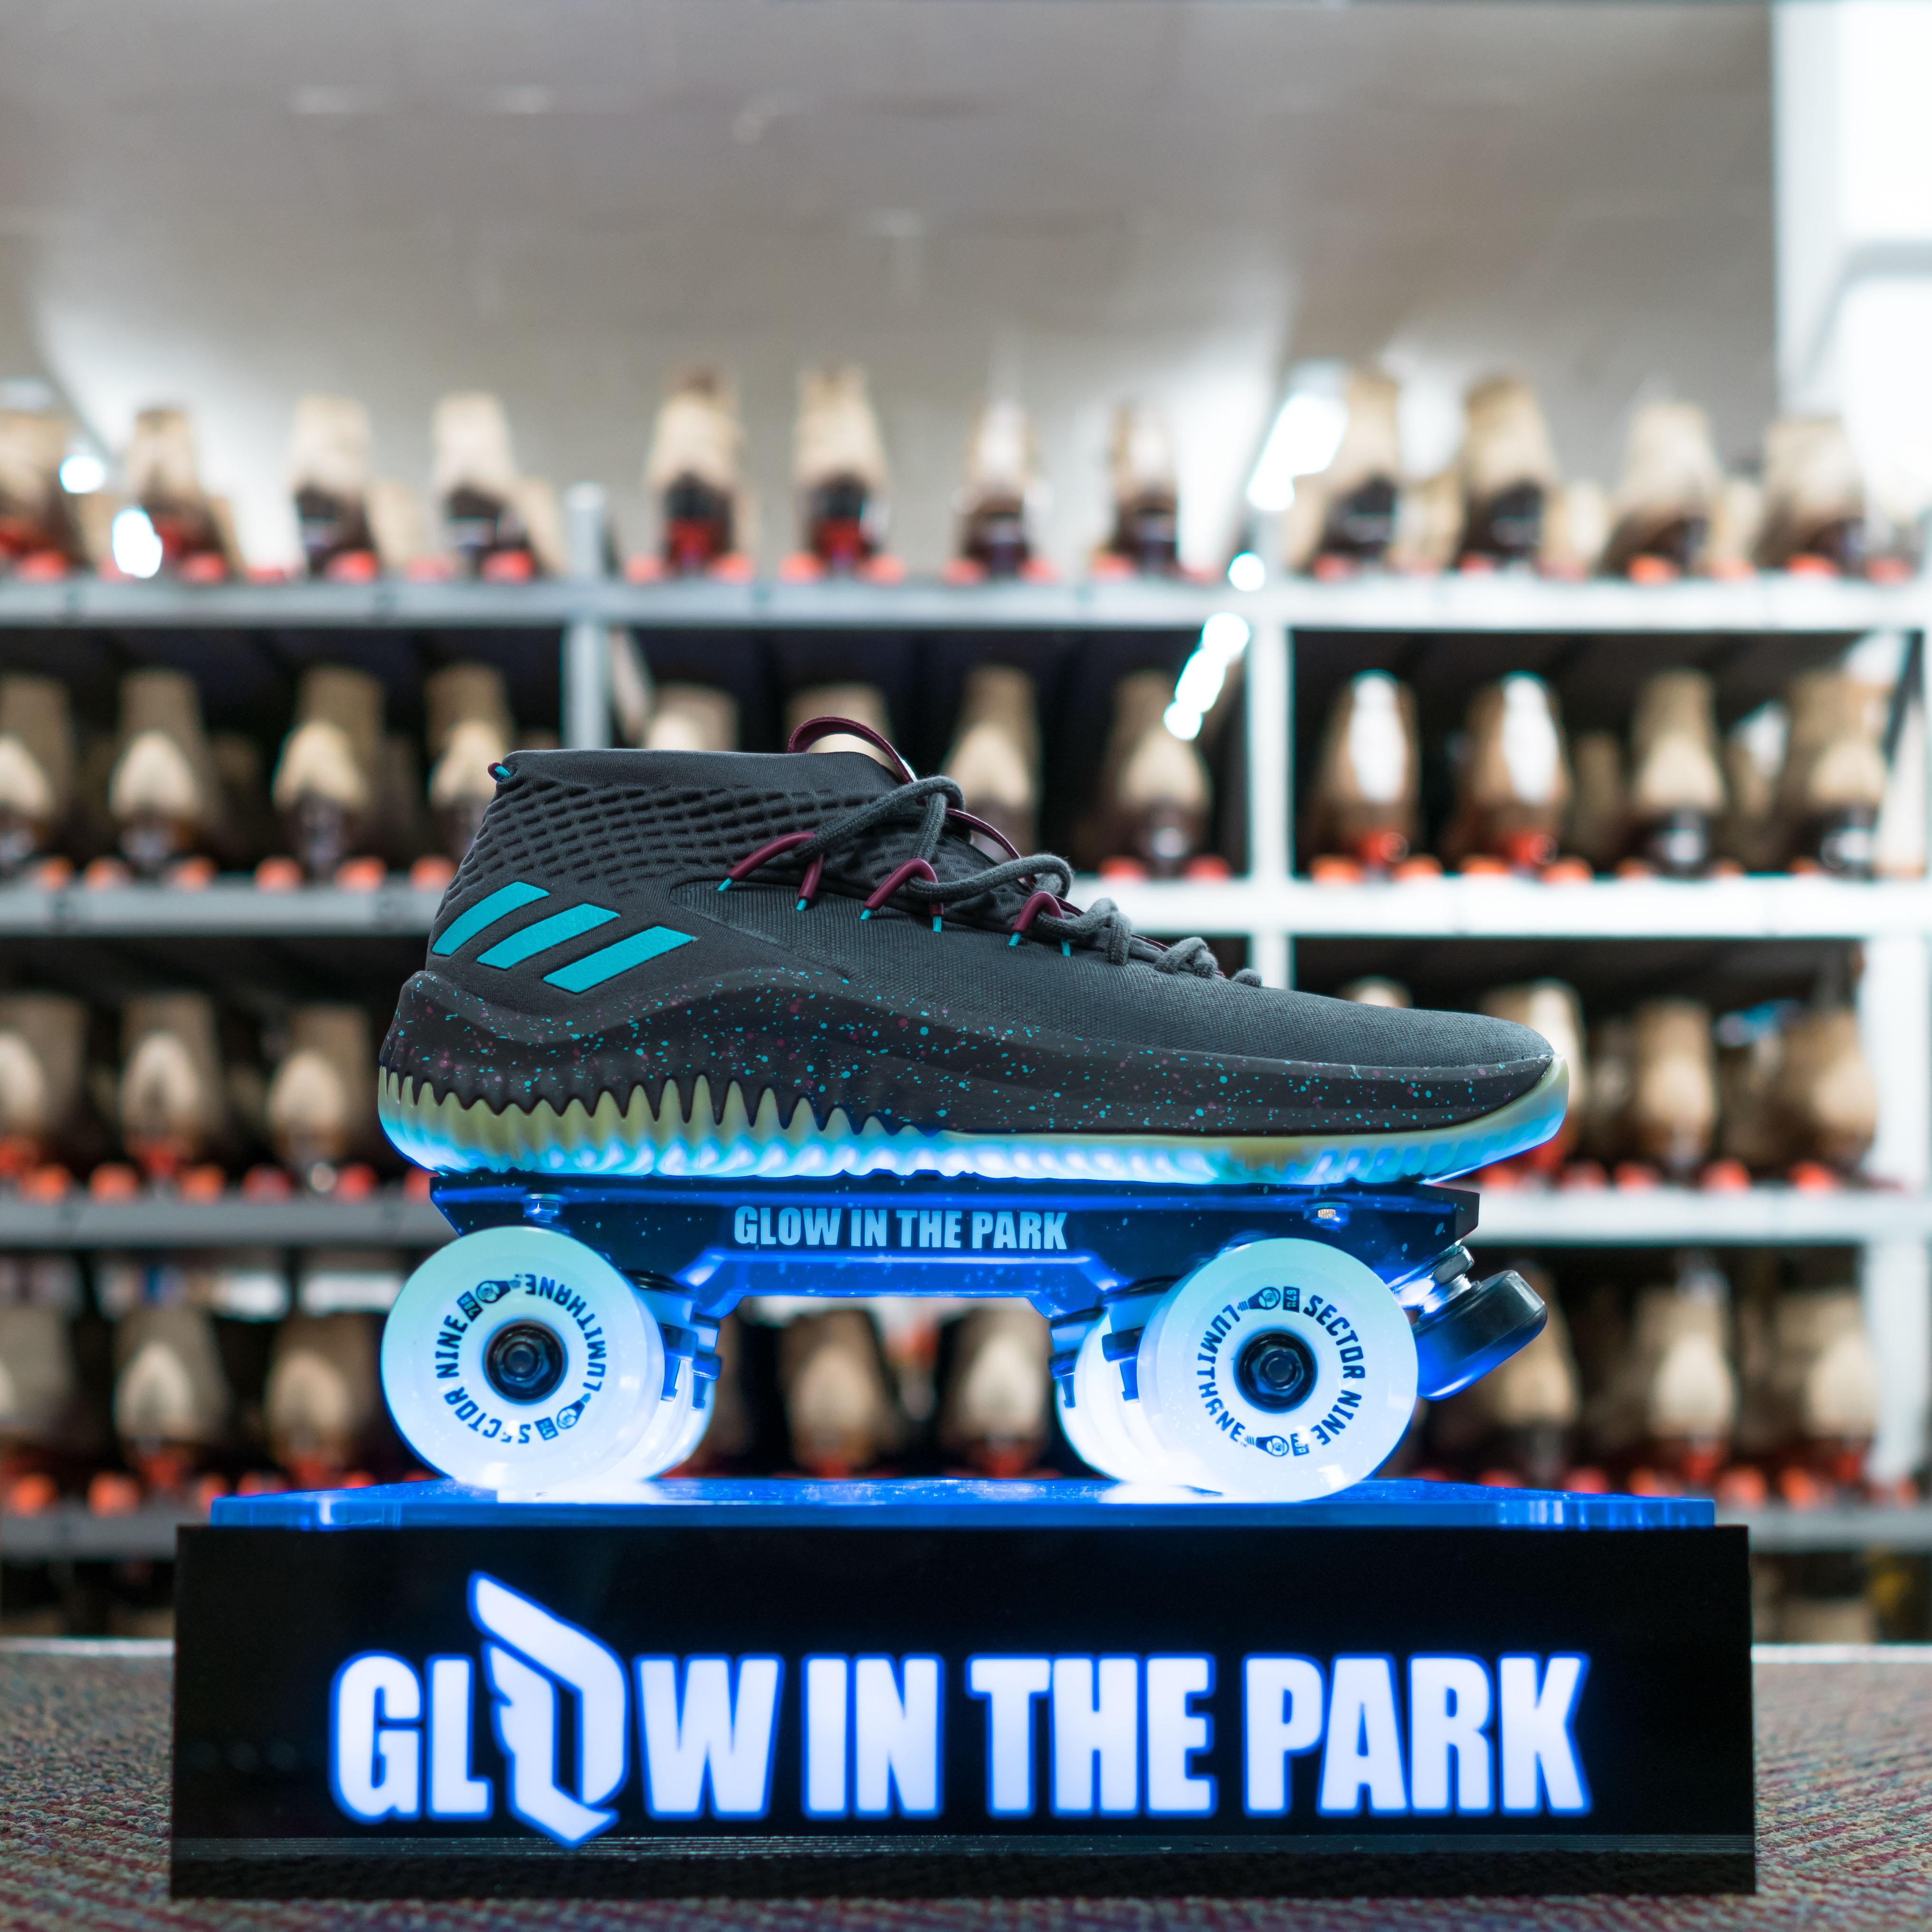 Adidas turned Damian Lillard's shoes